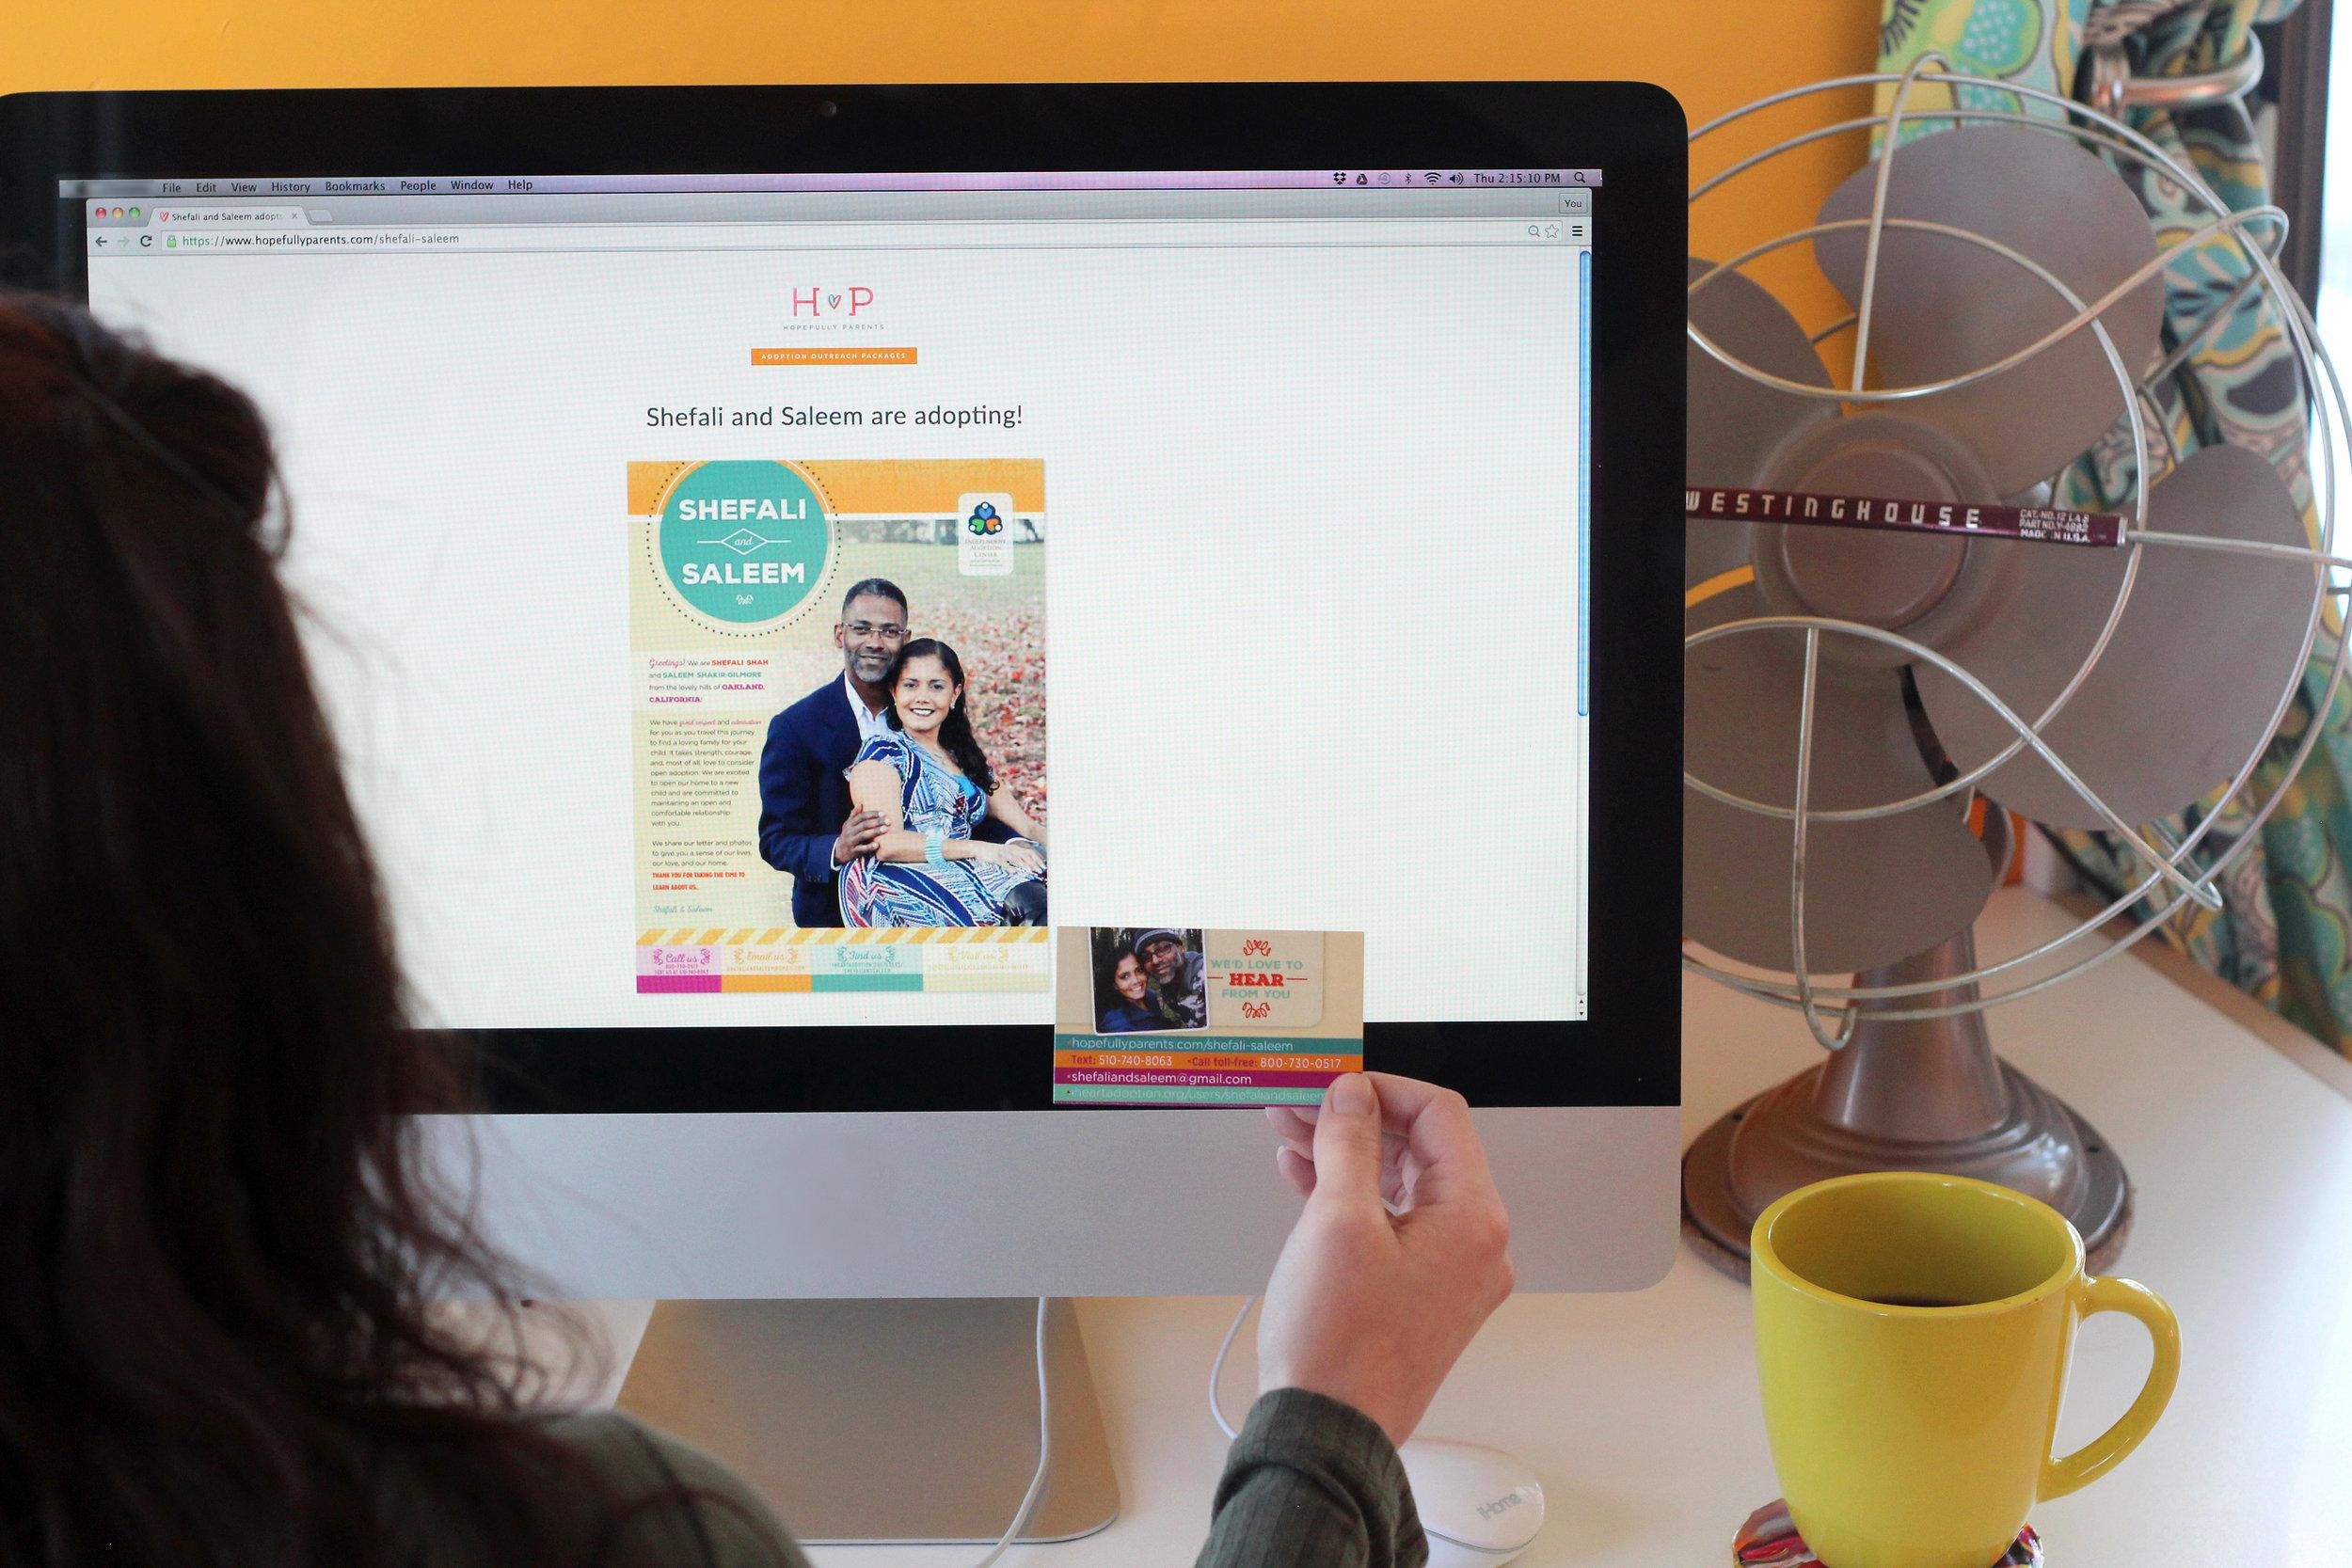 profile hosting hopefully parents adoption outreach find birthmother